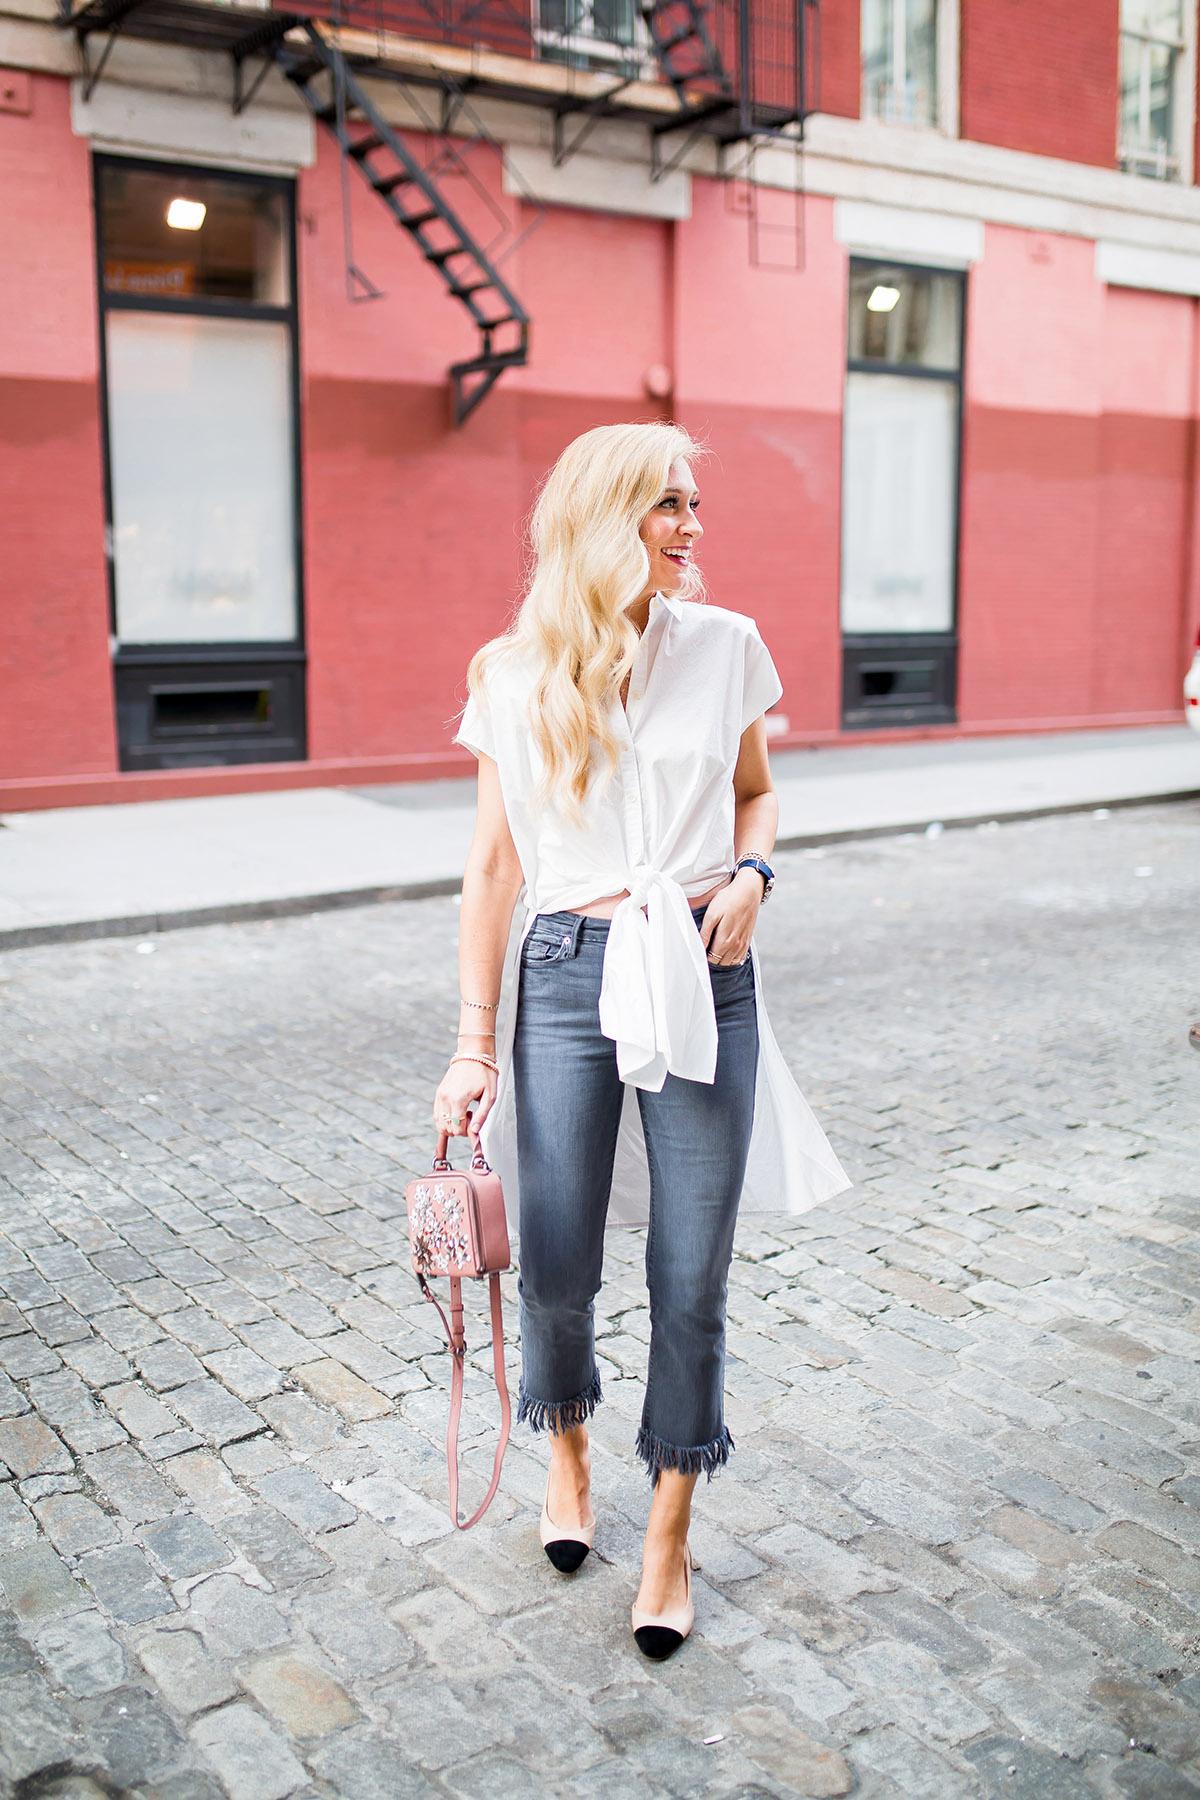 How to Wear the Fall Raw Hem Jean Trend